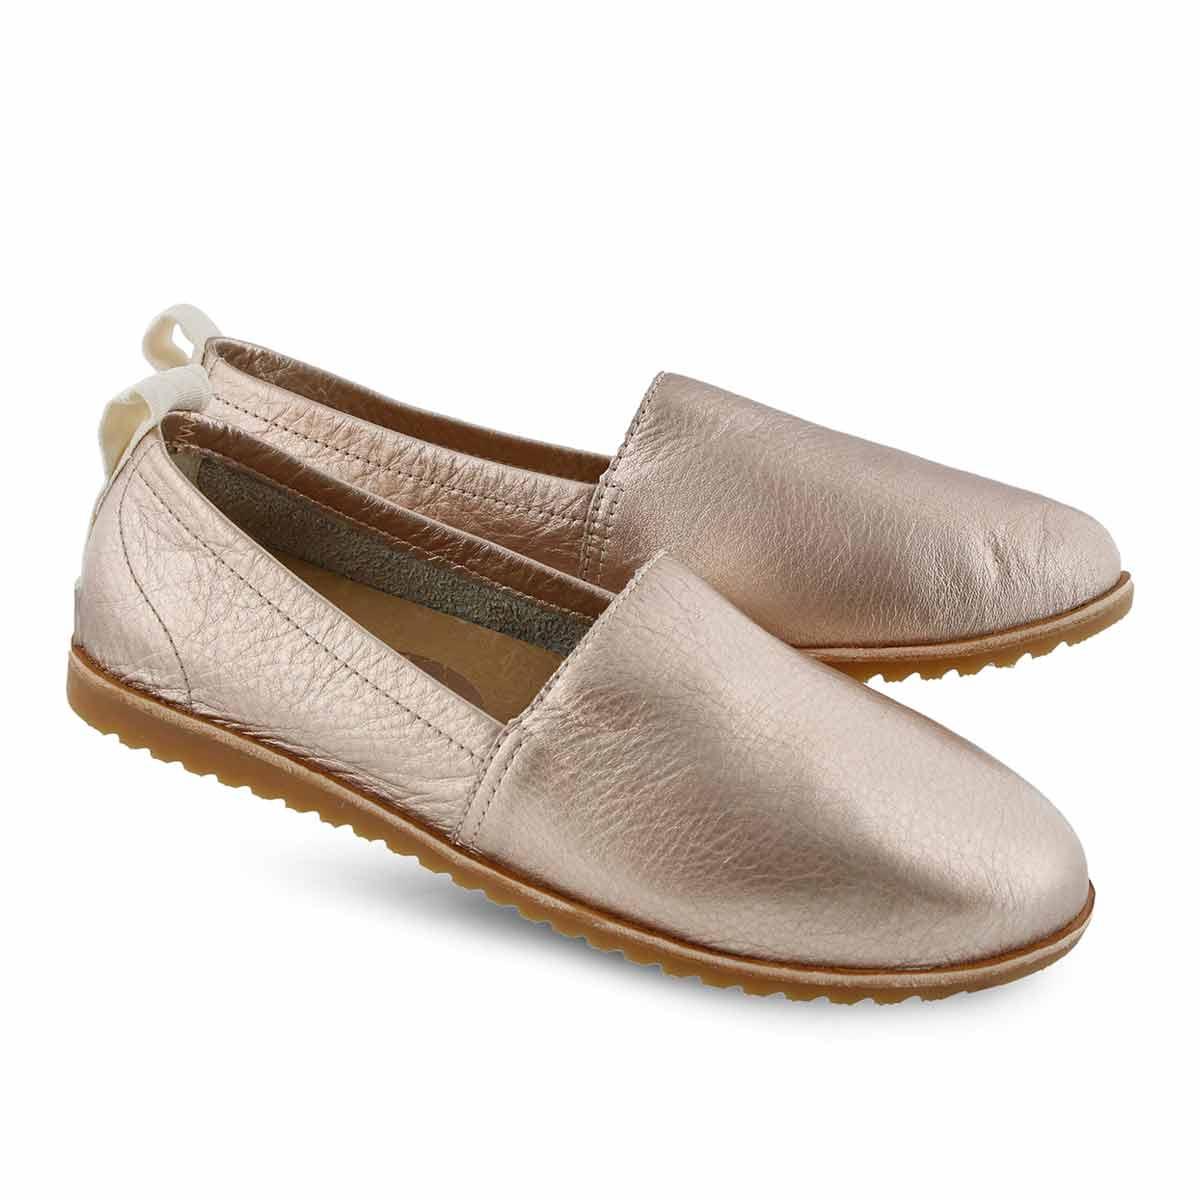 Lds Ella warm gold casual slip on shoe